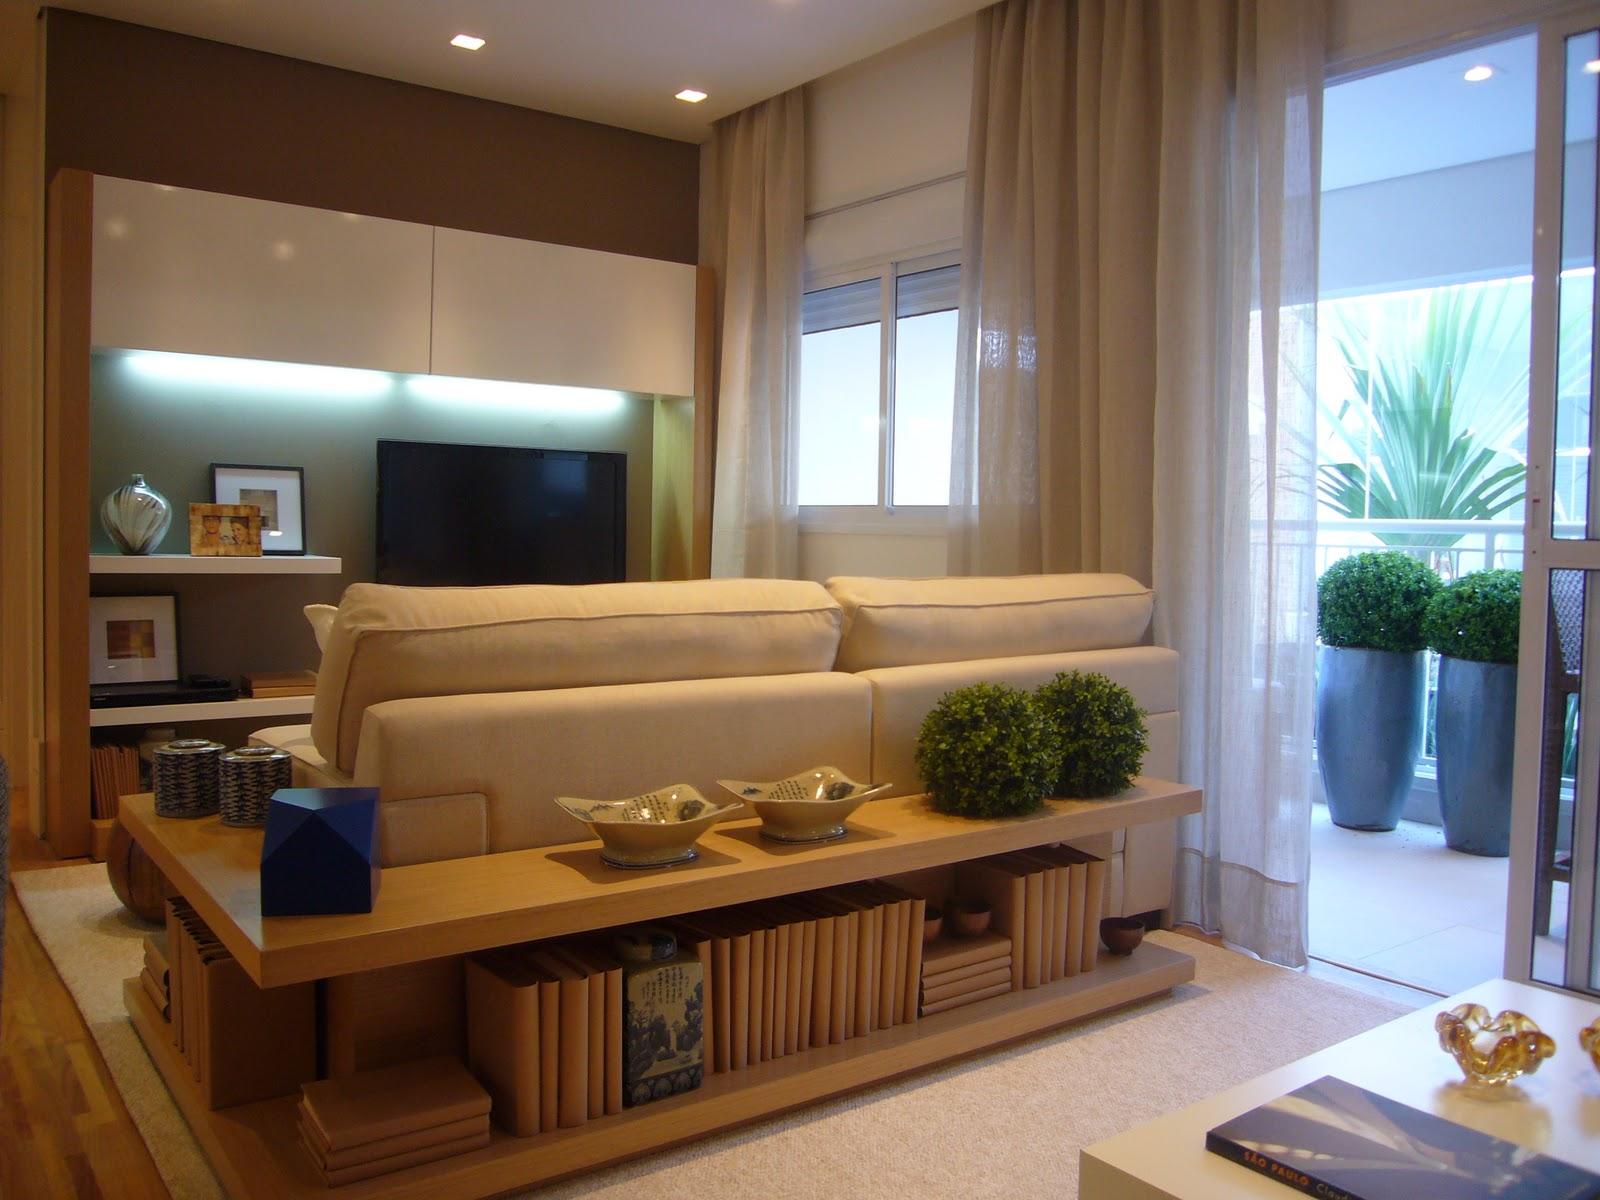 ideias e projetos de decoracao de interiores:MERCATTOUNO ®: MERCATTO GABRIEL: Alessandra Gavazzi Interiores